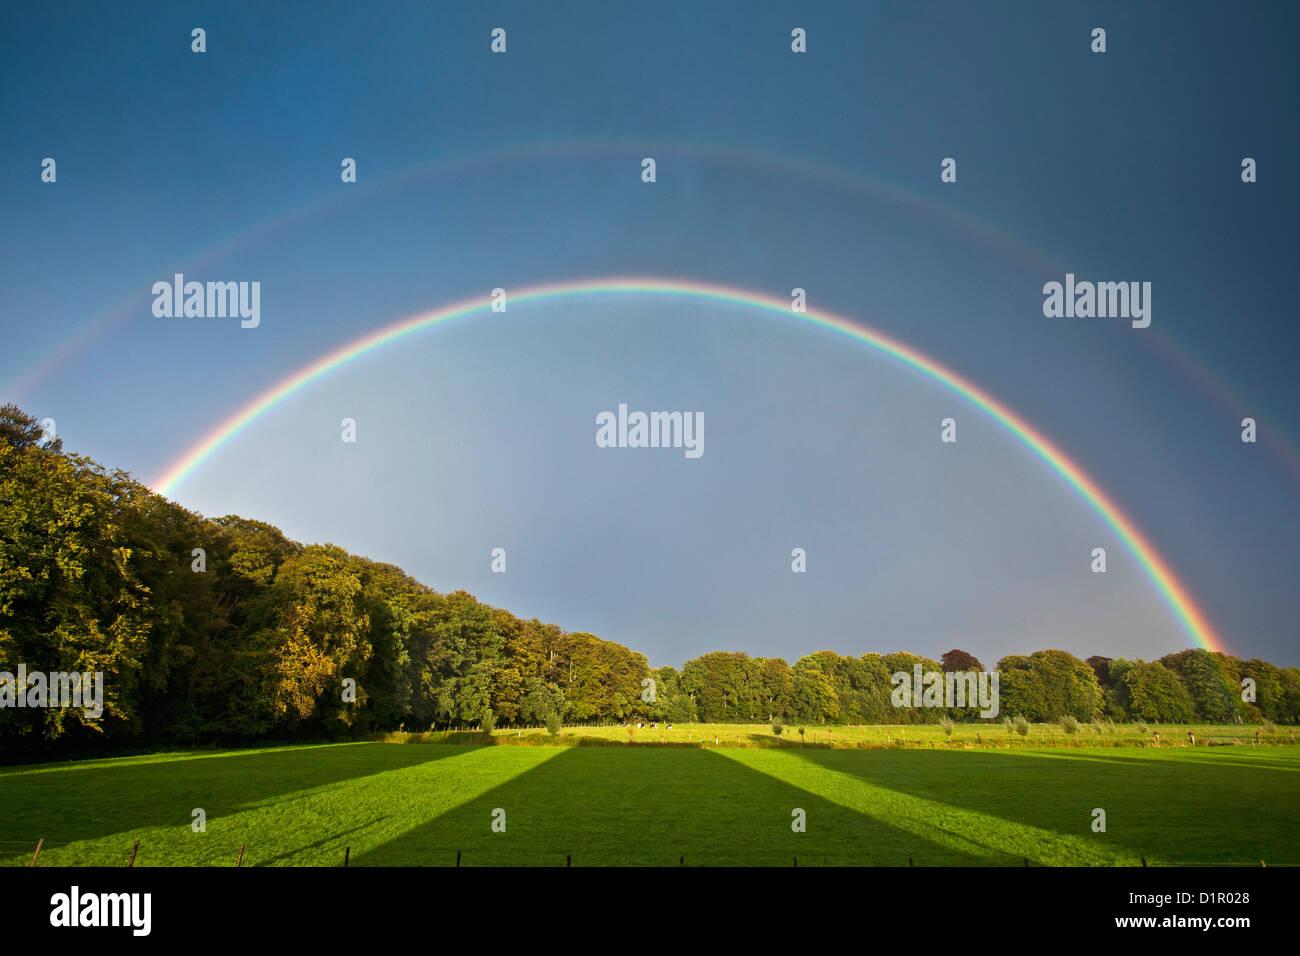 I Paesi Bassi, 's-Graveland. Tenuta rurale chiamato Hilverbeek. Doppio arcobaleno. Immagini Stock